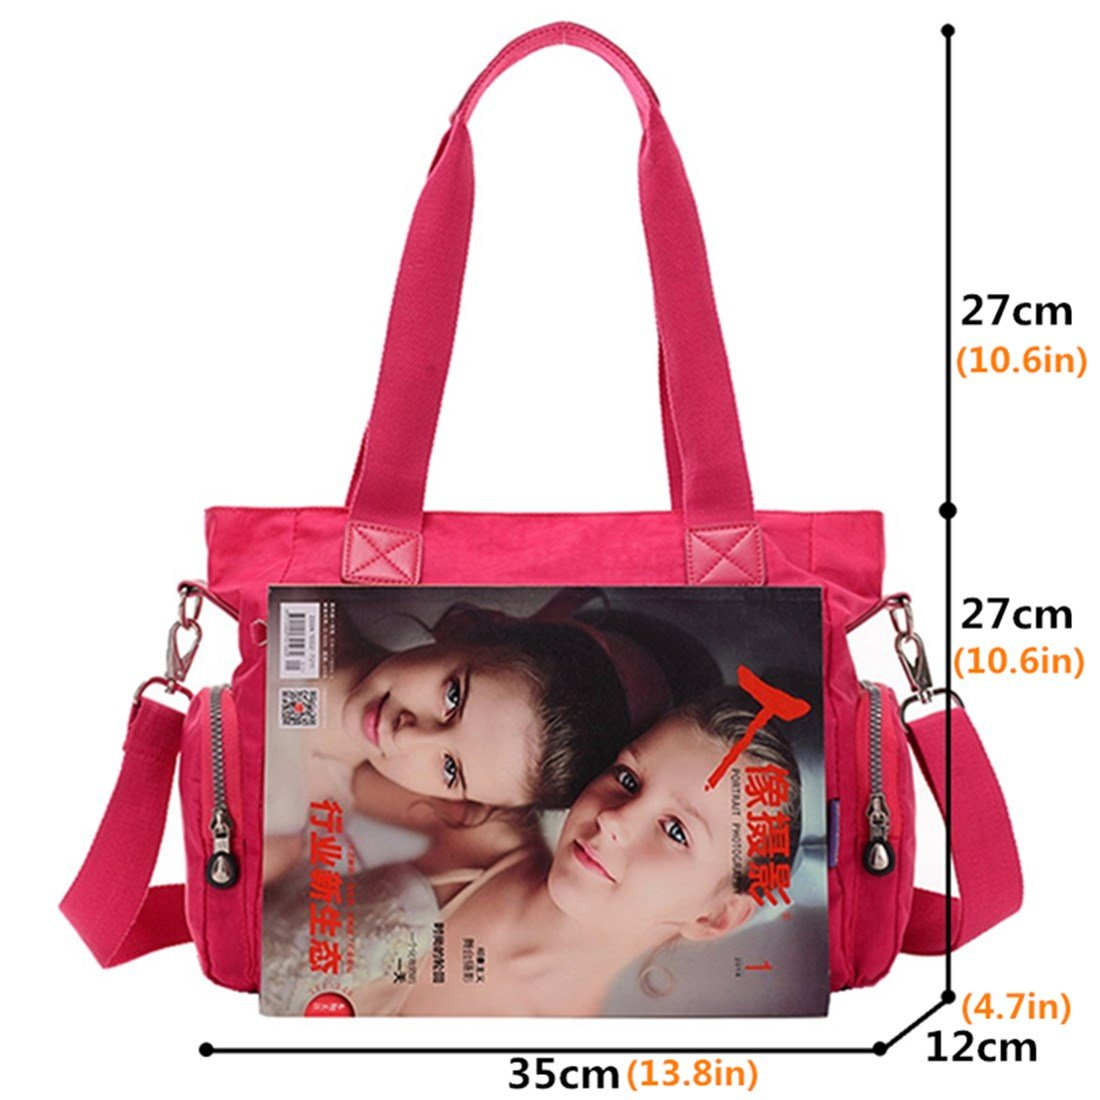 d1b5f0beb23f Amazon.com: Big Mango Fashion Lightweight Women's Top Handle Handbag  Satchel Purse Shoulder Tote Bag Crossbody Bag: Shoes